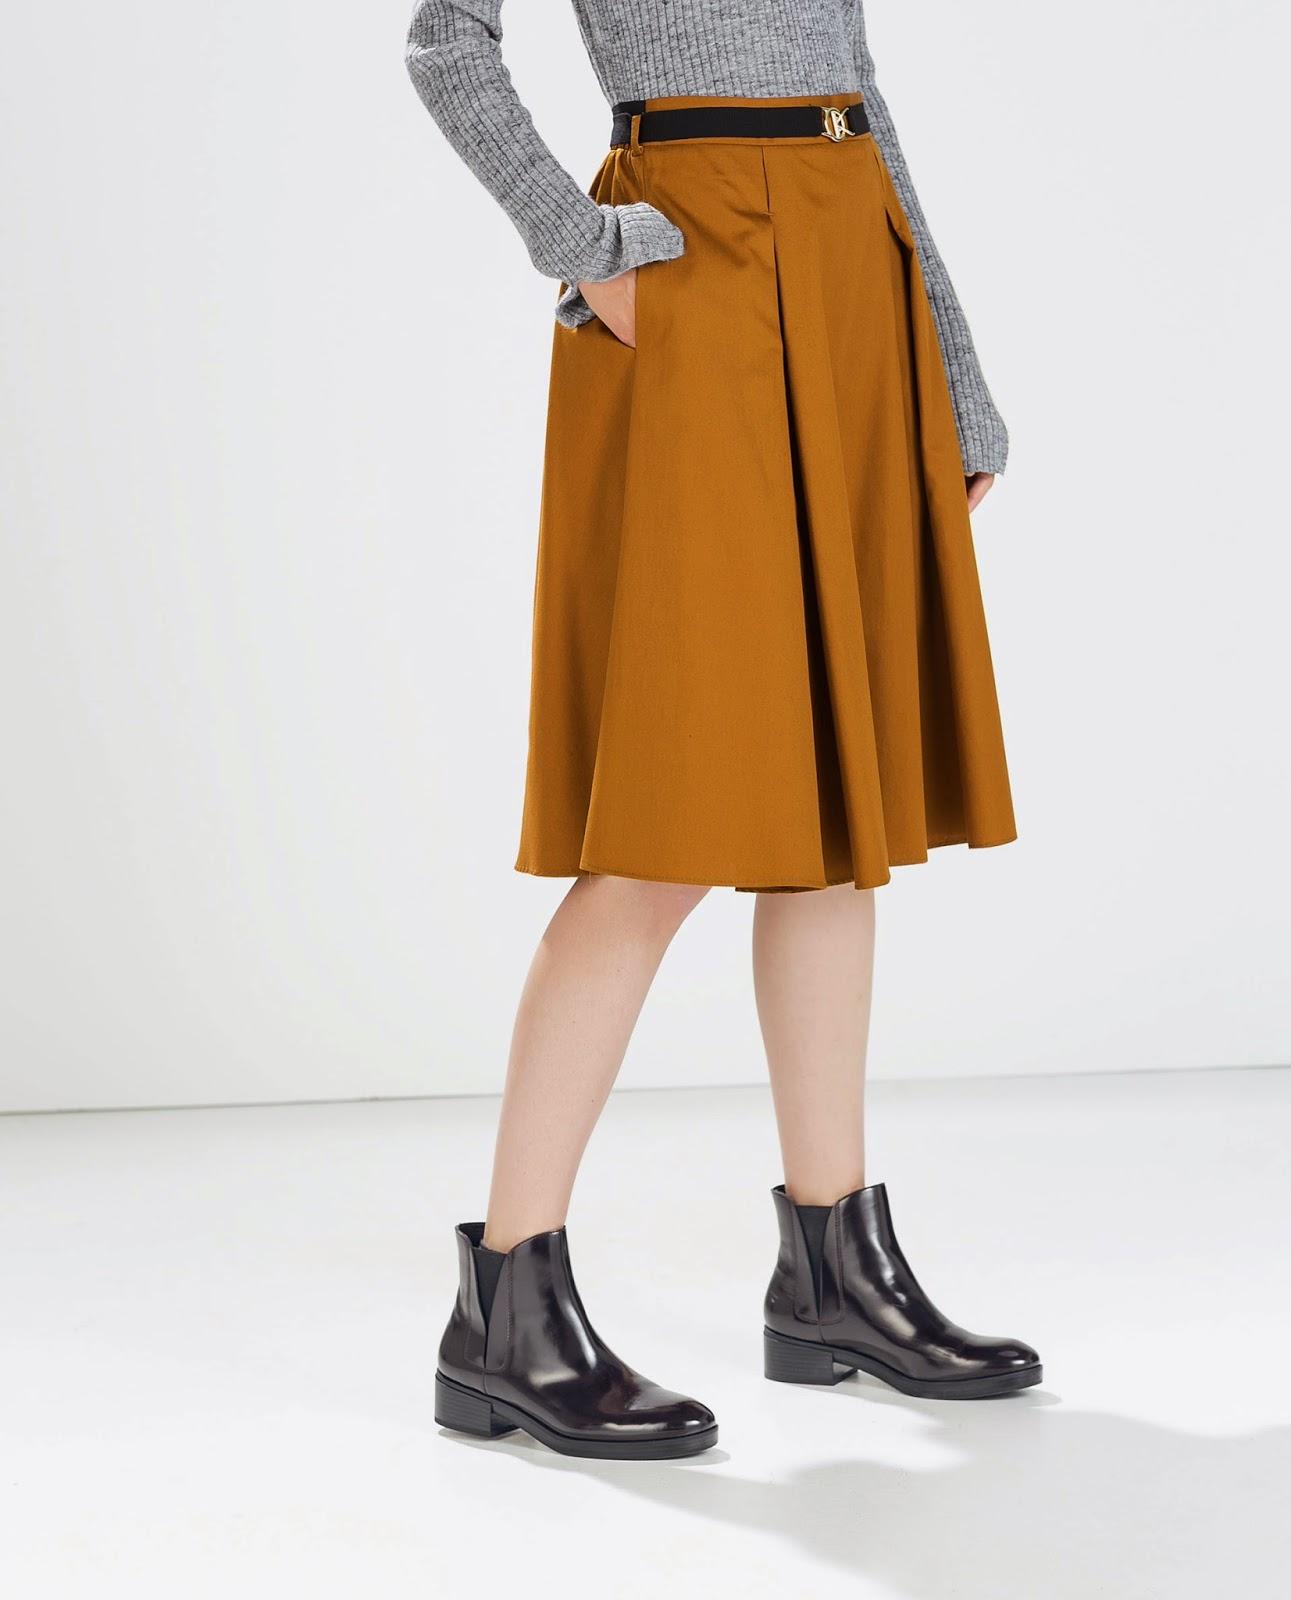 zara mustard skirt